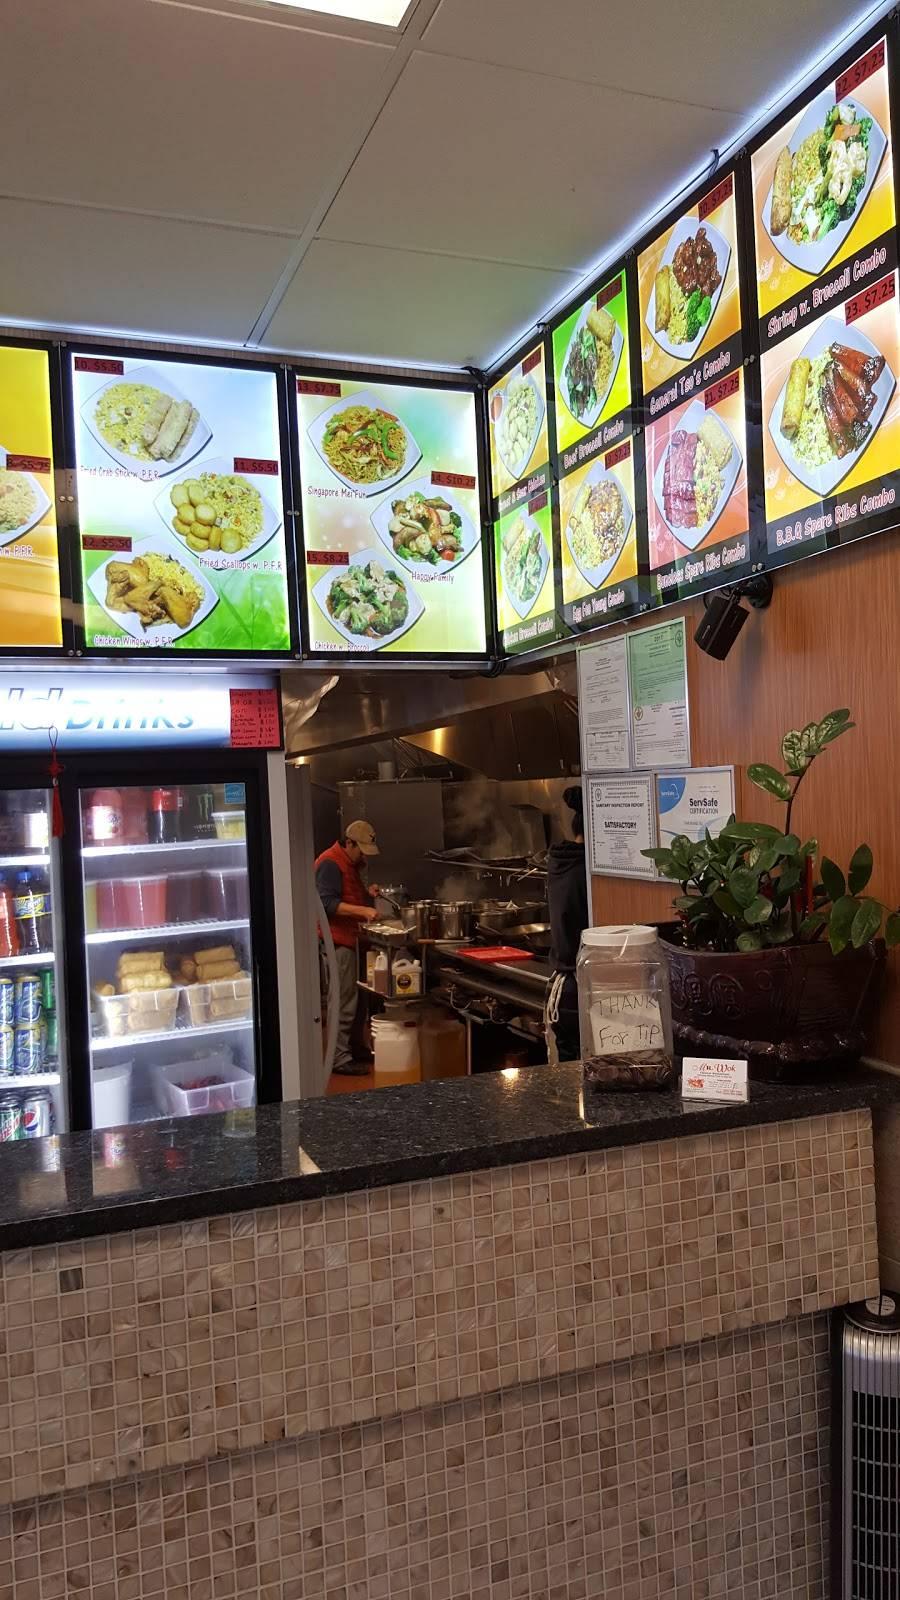 Mr. Wok | restaurant | 1250 S Broad St, Trenton, NJ 08610, USA | 6099898889 OR +1 609-989-8889